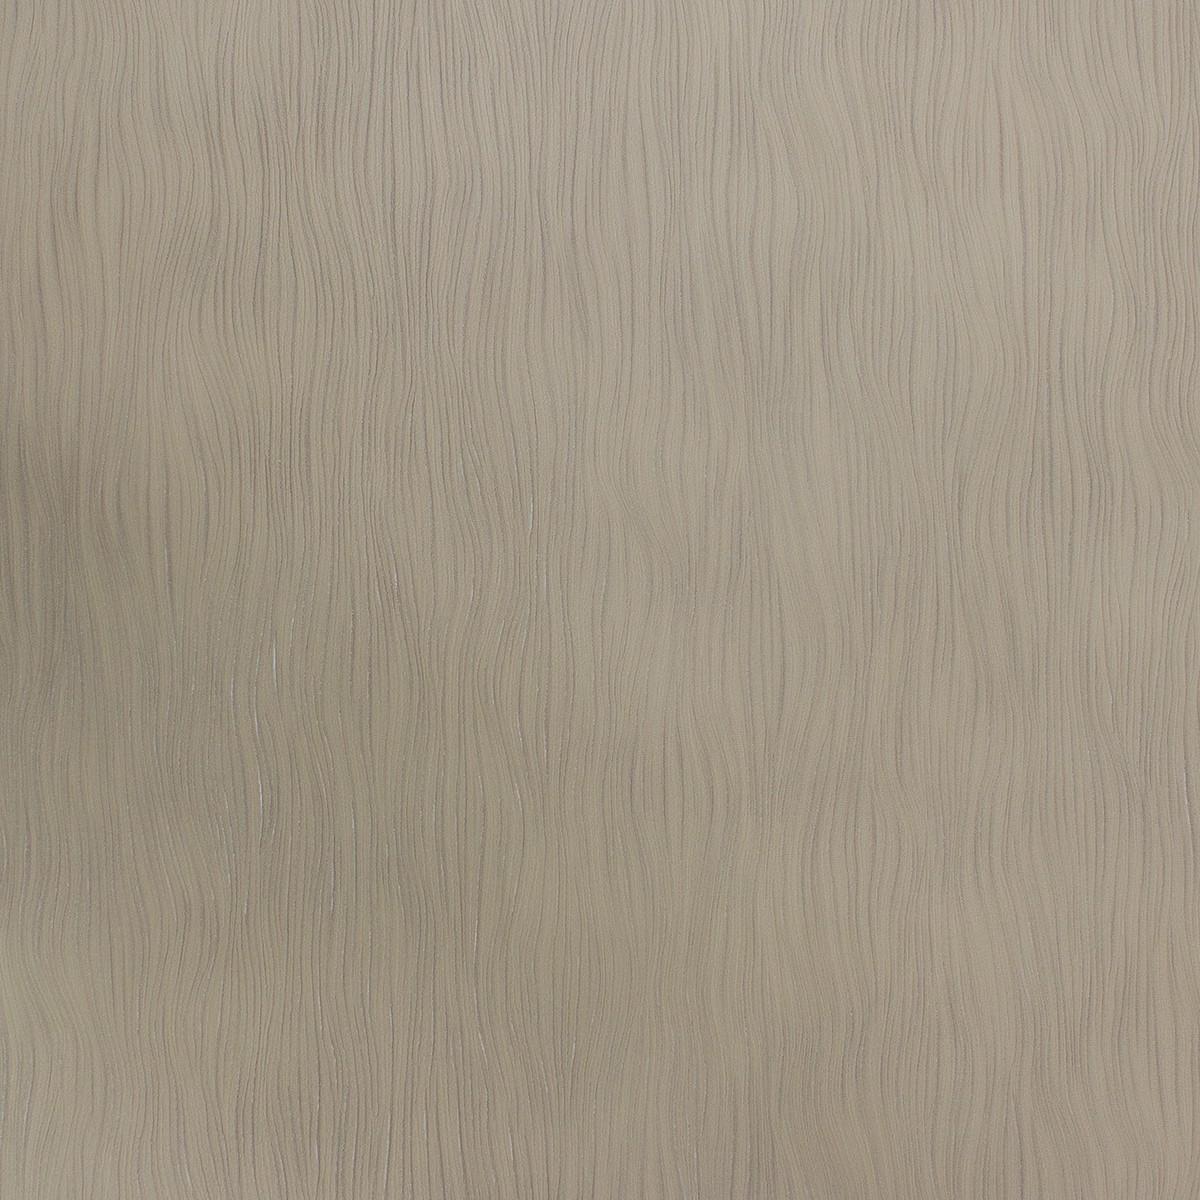 vliestapete luigi colani struktur grau wei 53357. Black Bedroom Furniture Sets. Home Design Ideas